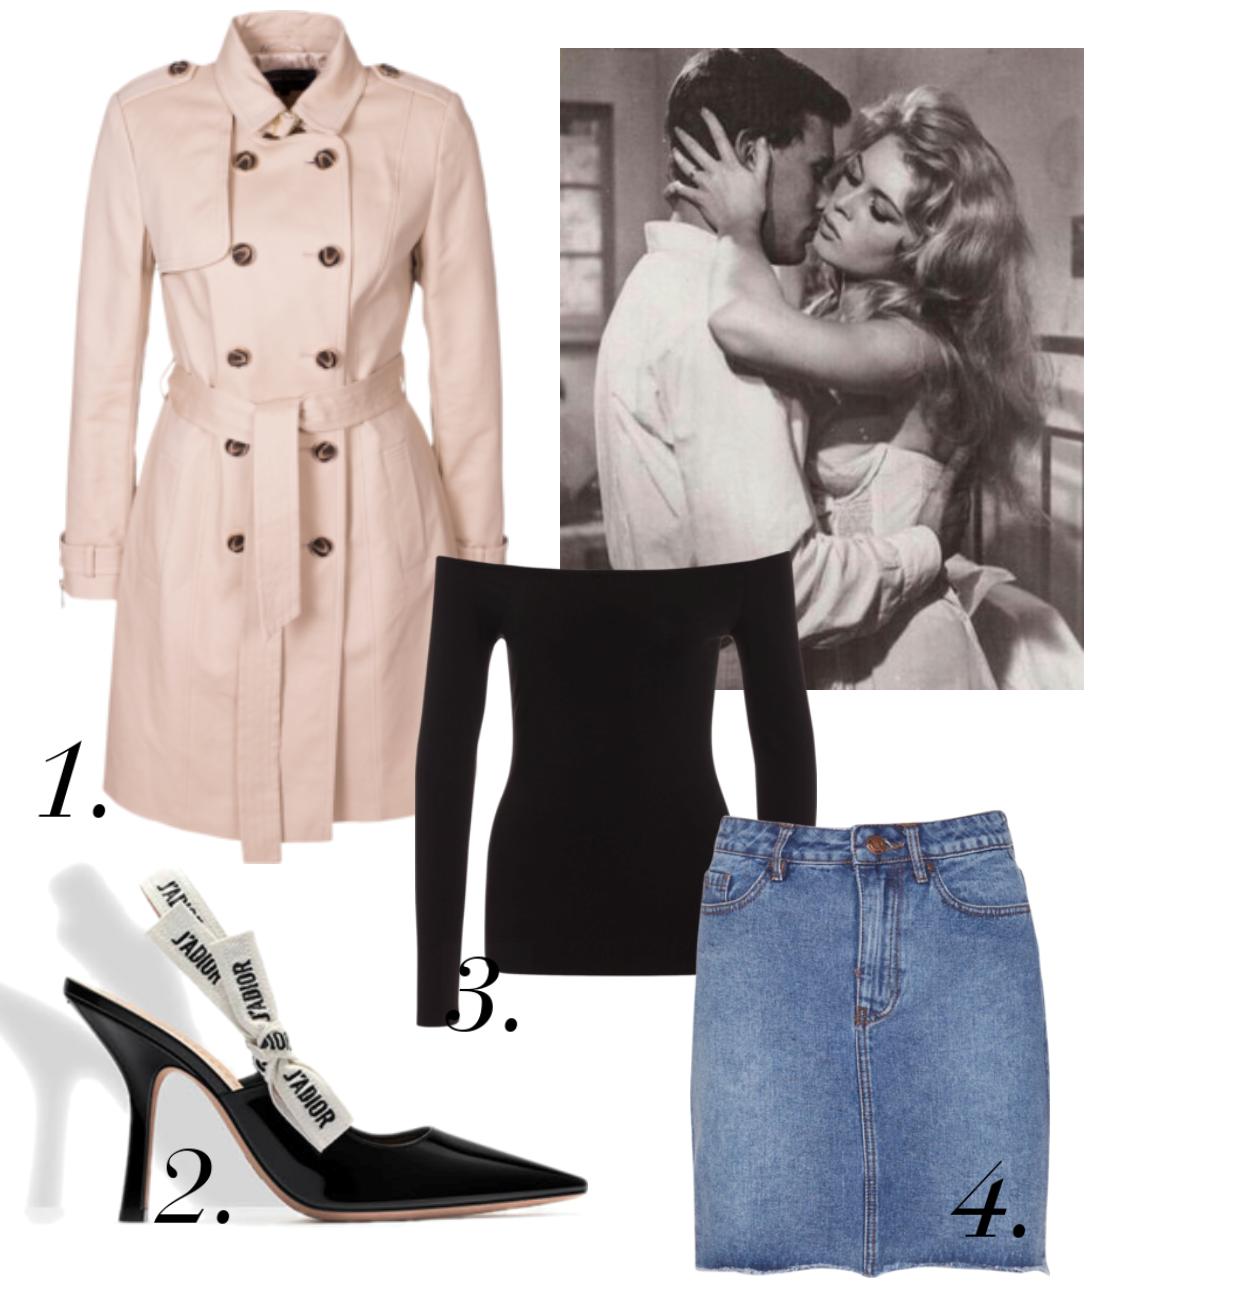 Style Icons: Brigitte Bardot